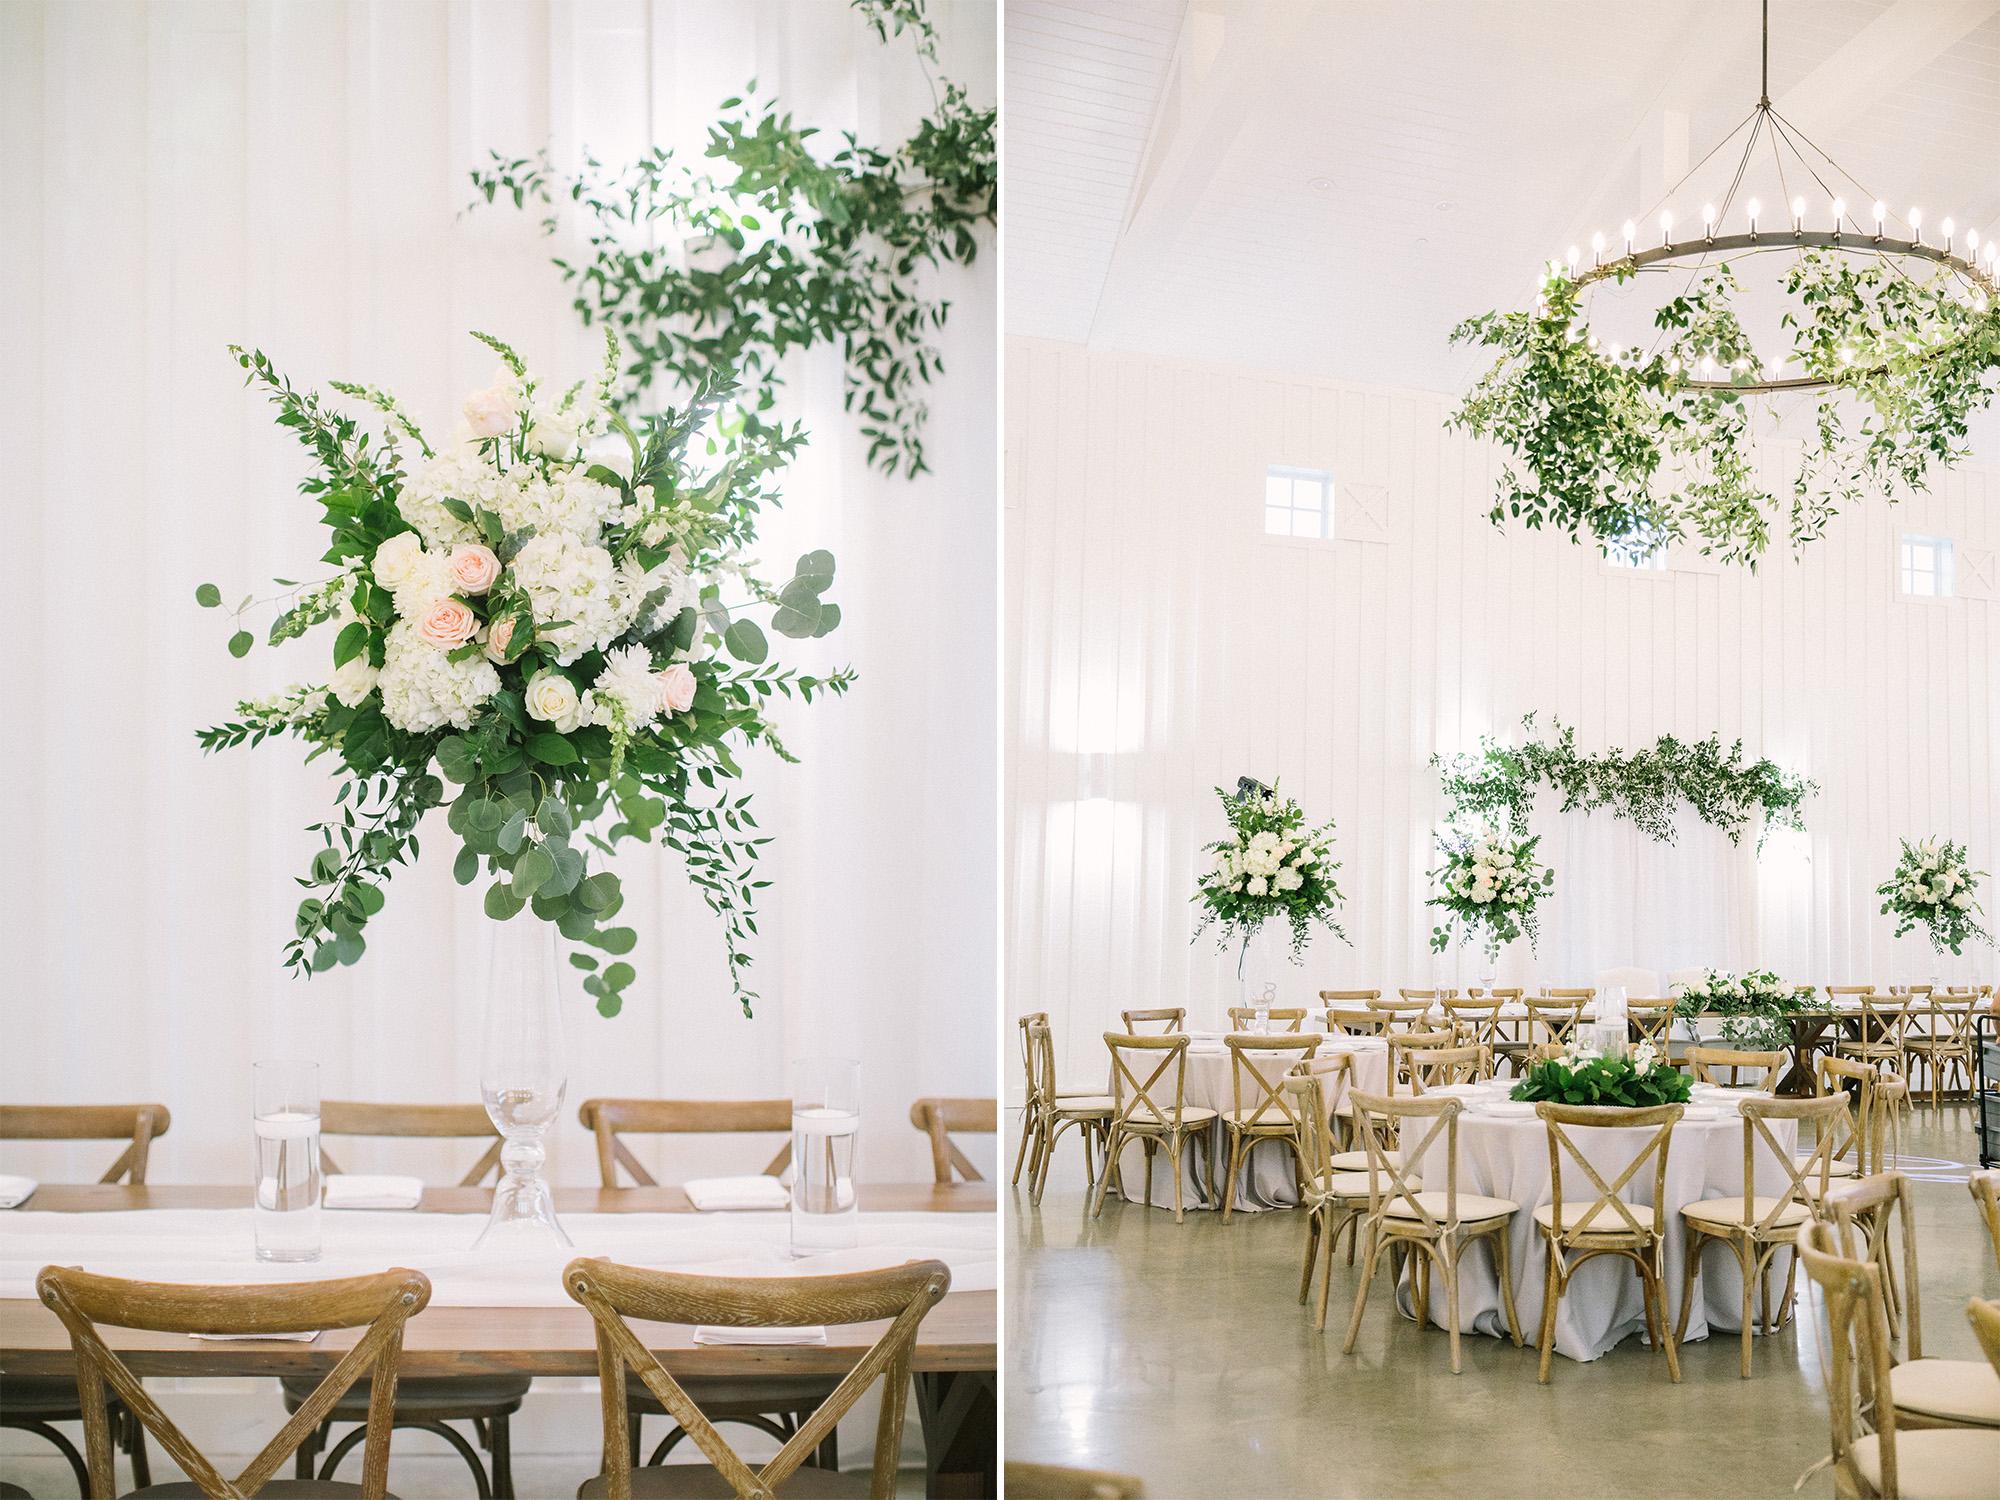 Ellen-Ashton-Photograph-Dallas-Wedding-Photographers--The-Farmhouse-Weddings-Wed-and-Prosper-Weddings8.jpg